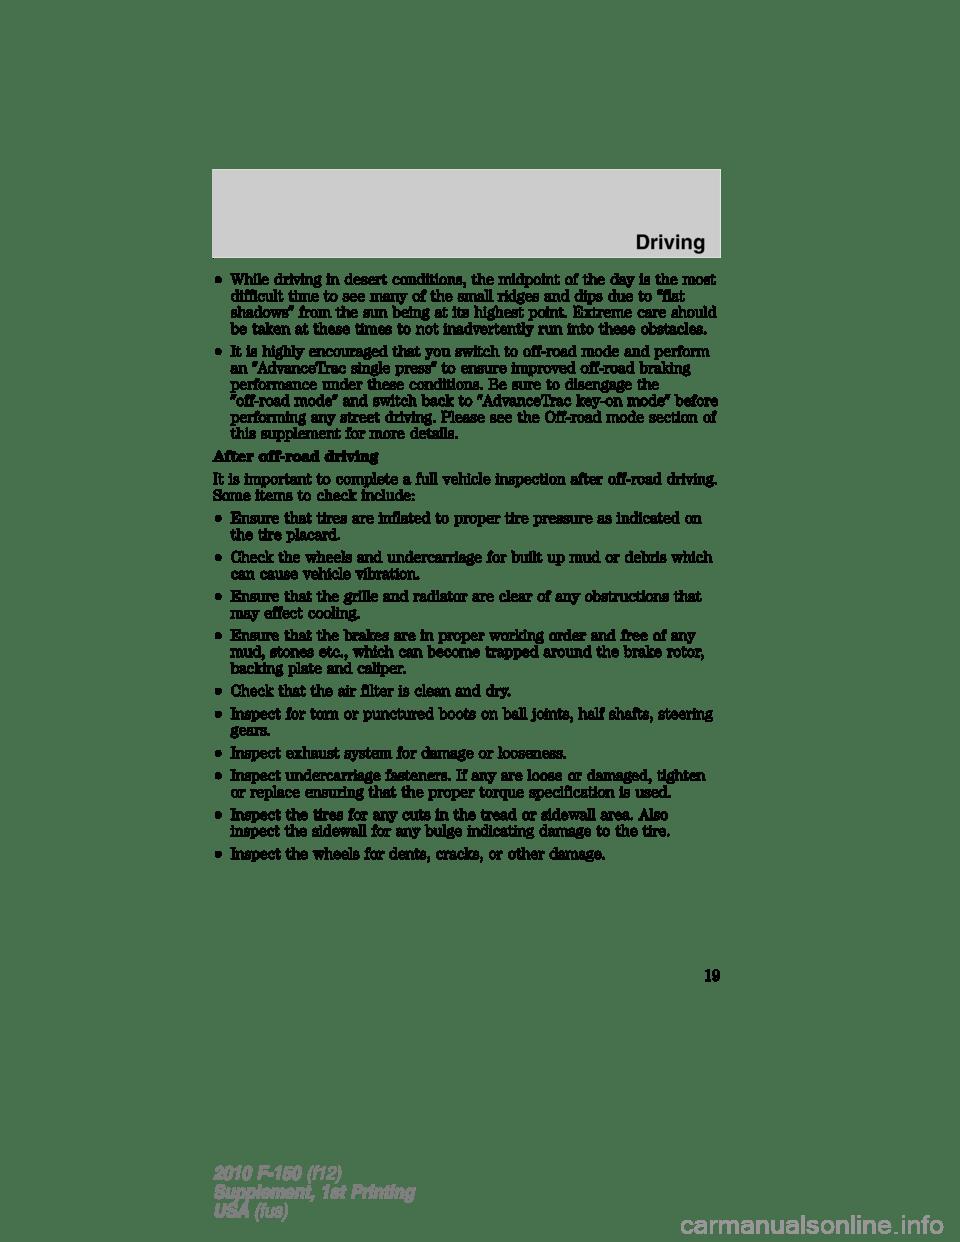 FORD F150 2010 12.G Raptor Supplement Manual